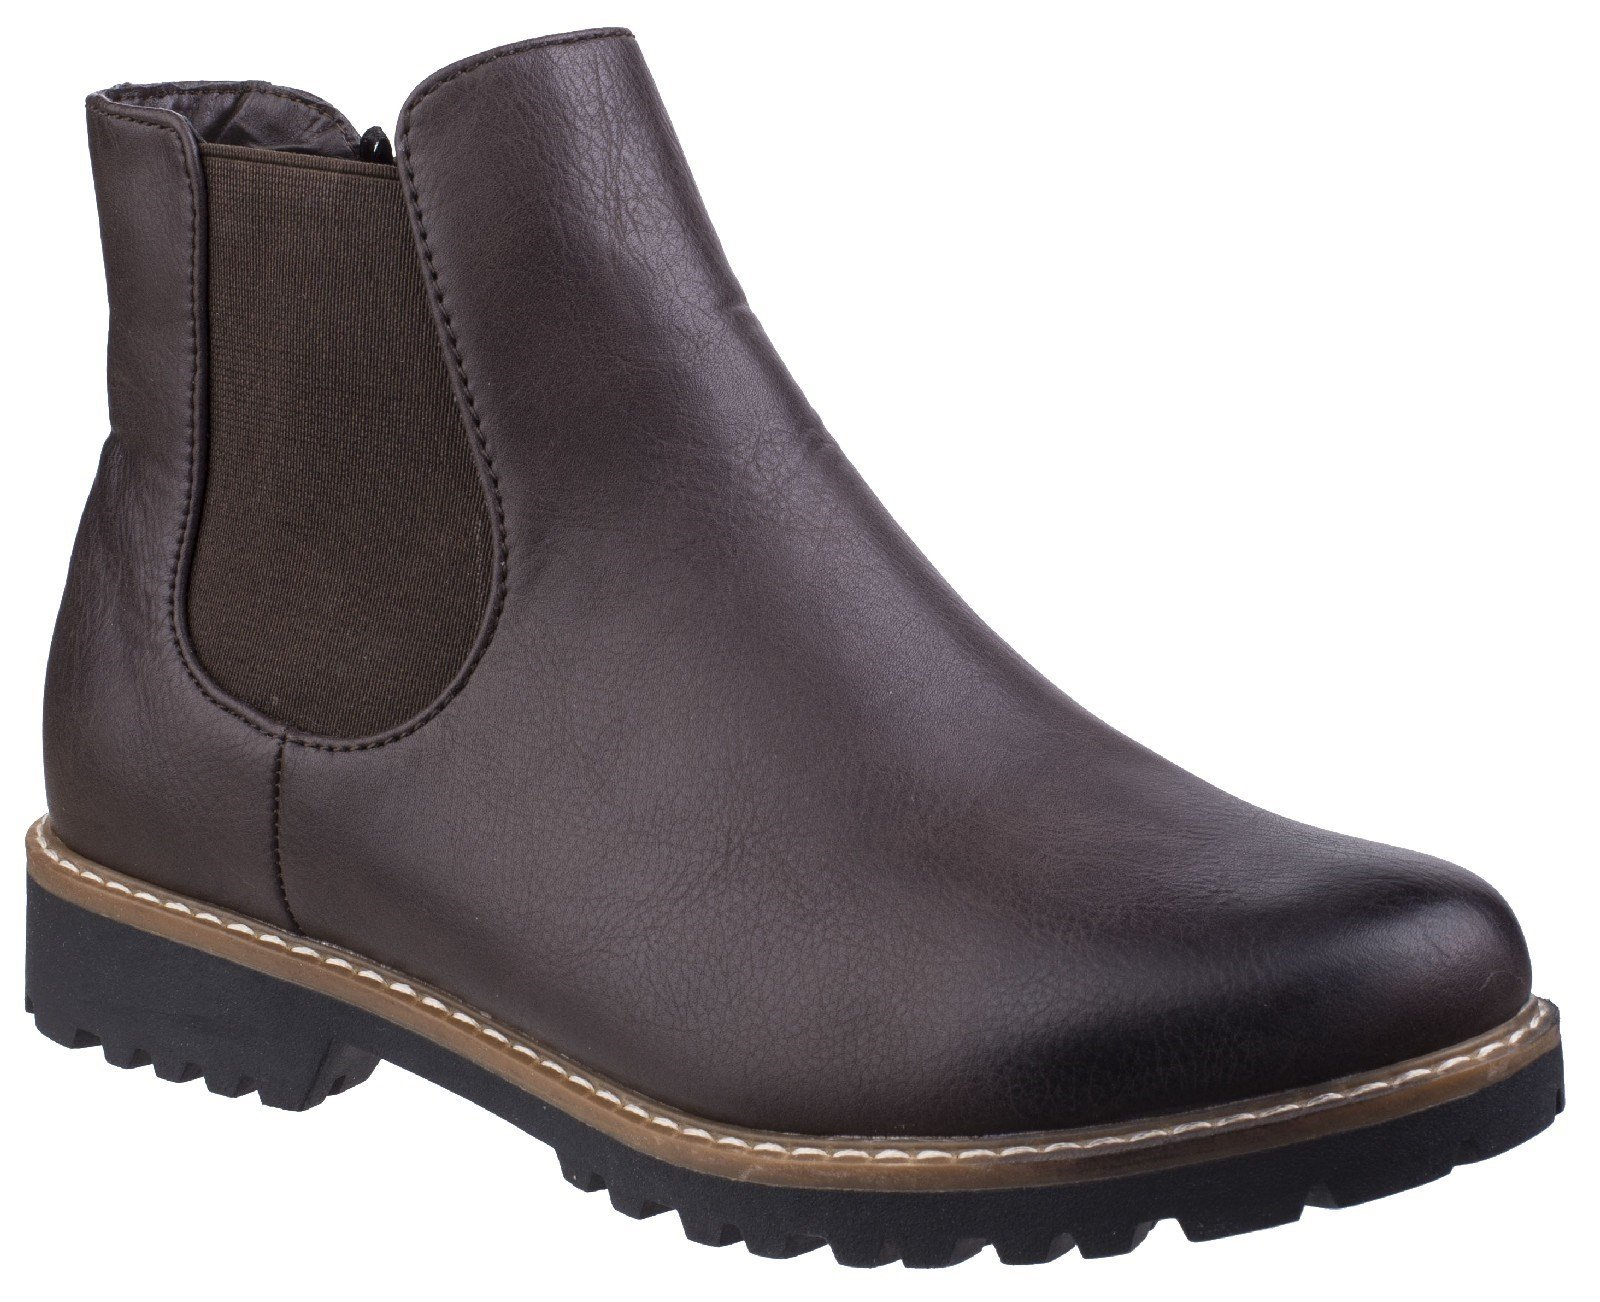 Divaz Women's Grace Ladies Chelsea Boot Black 25571-42565 - Brown 3